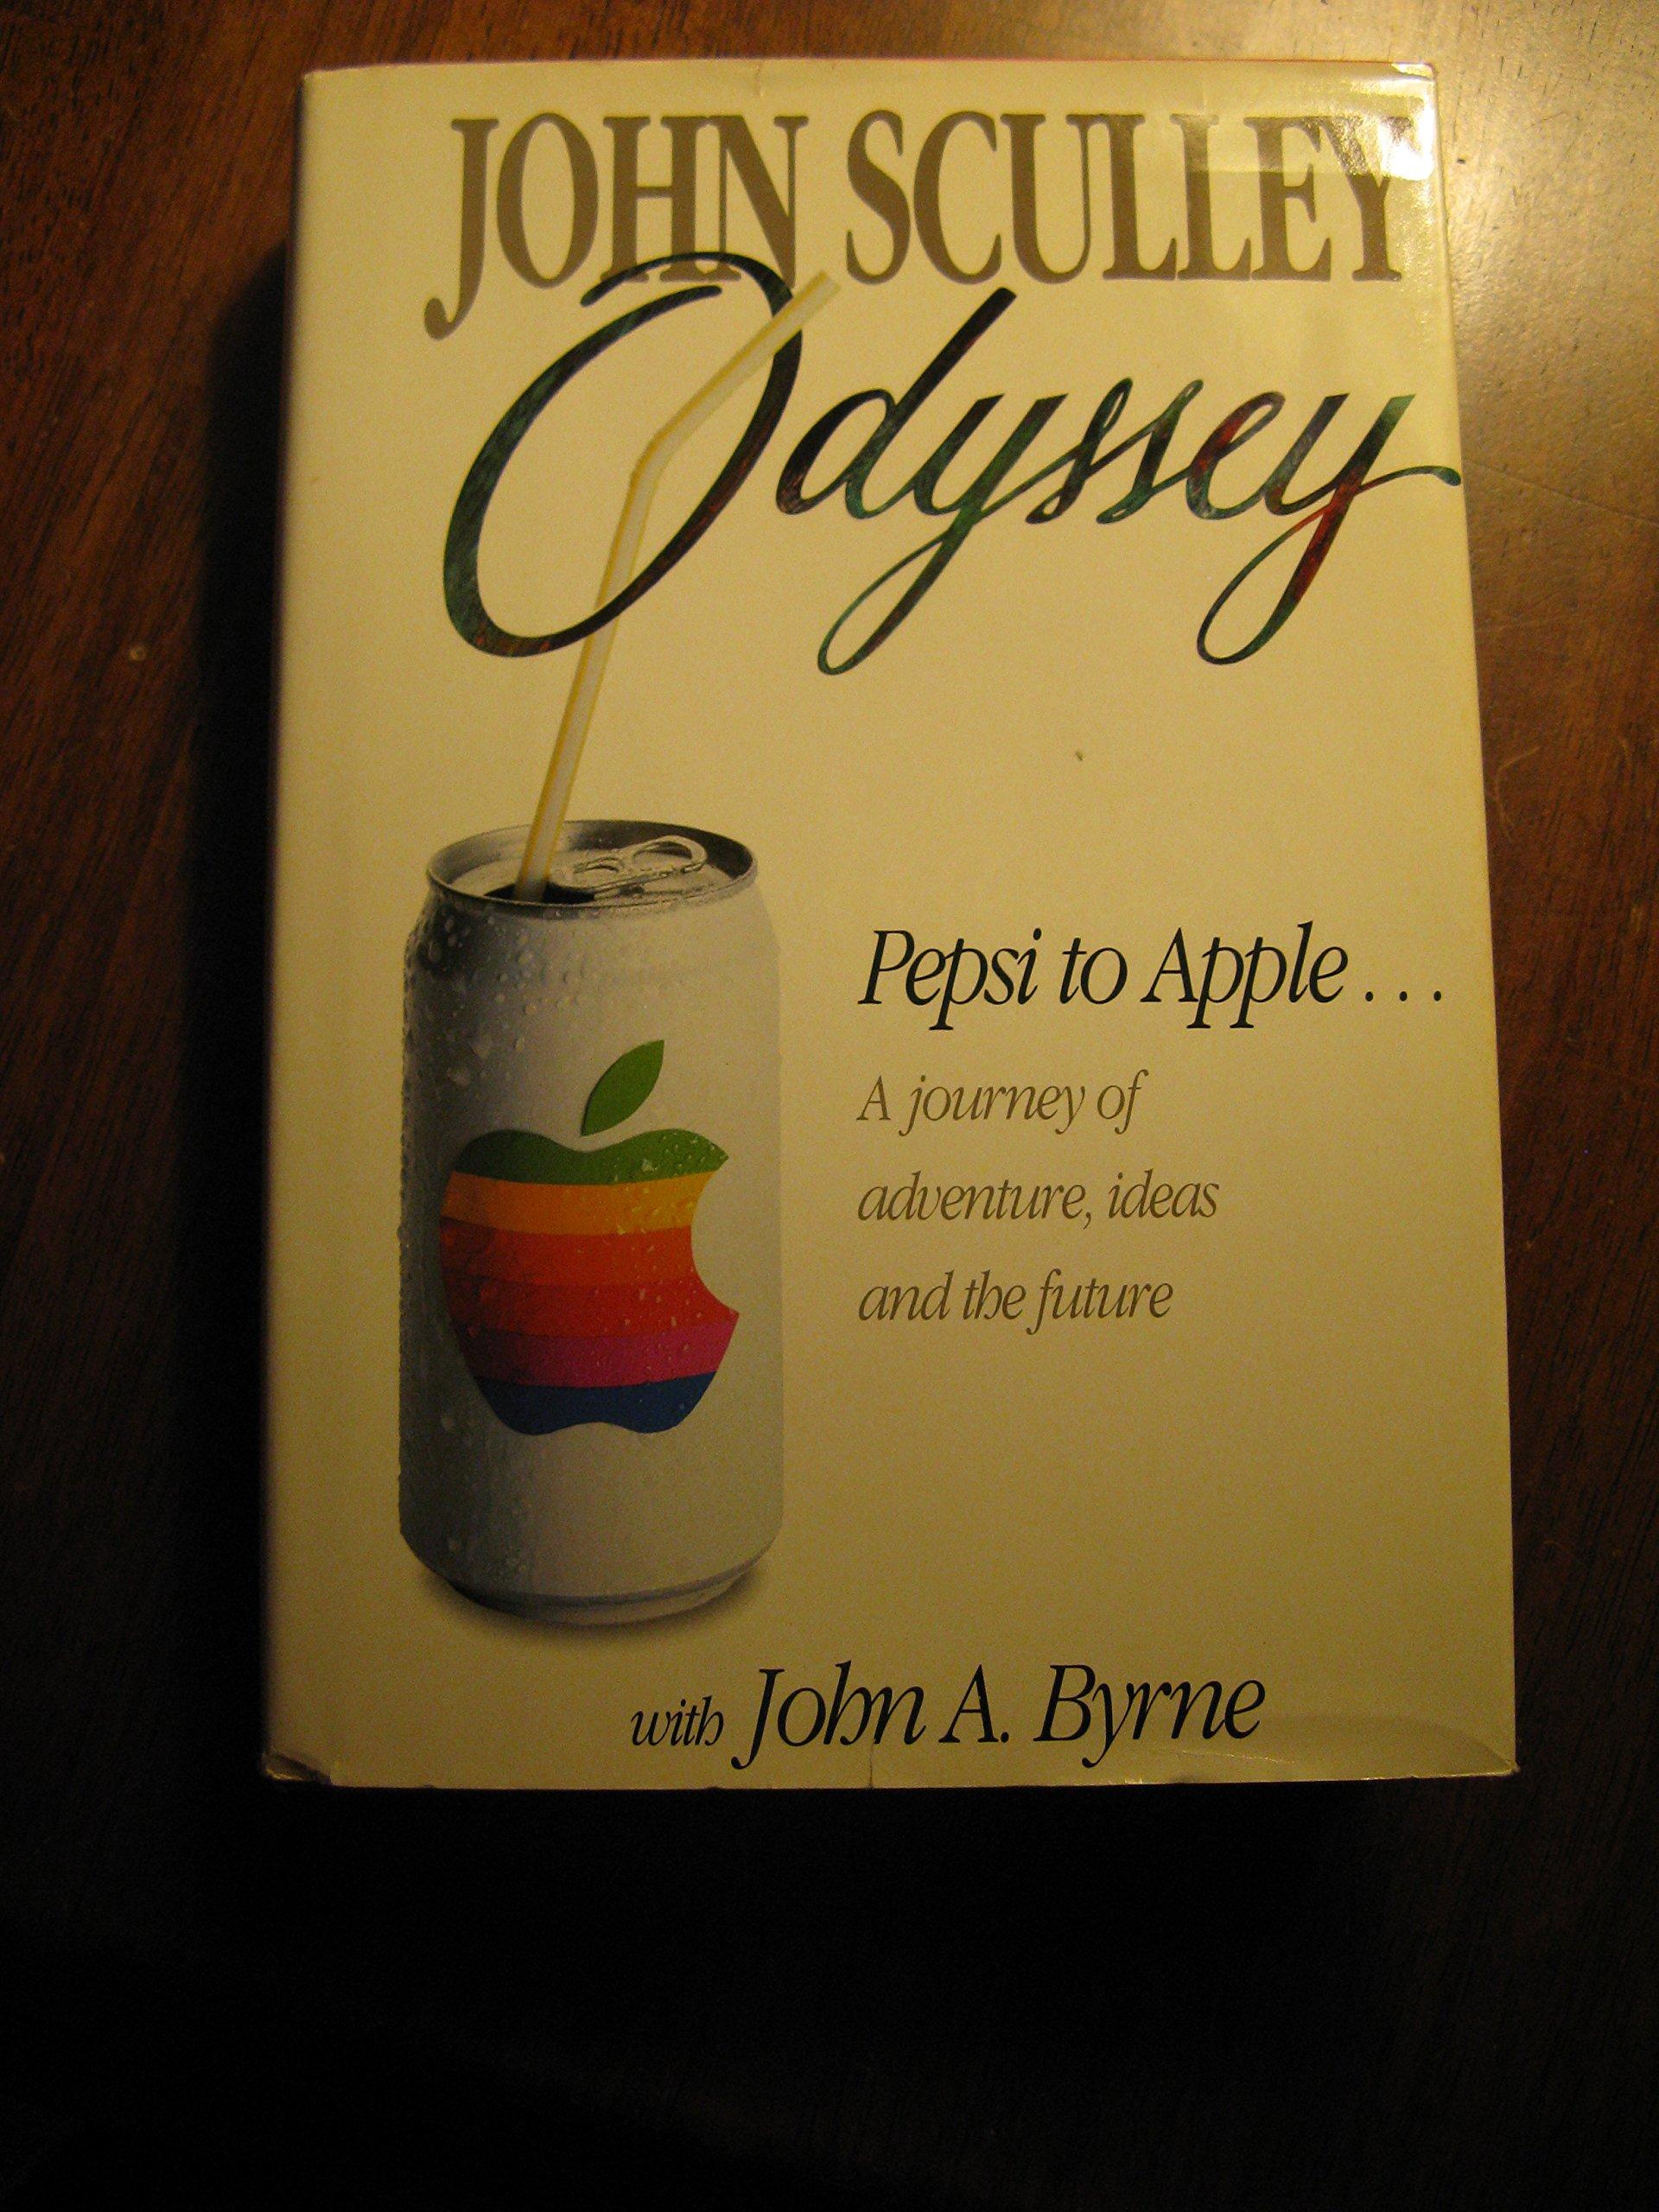 Odyssey: Pepsi to Apple : A Journey of Adventure, Ideas, and the Future: Amazon.es: Sculley, John, Byrne, John A.: Libros en idiomas extranjeros